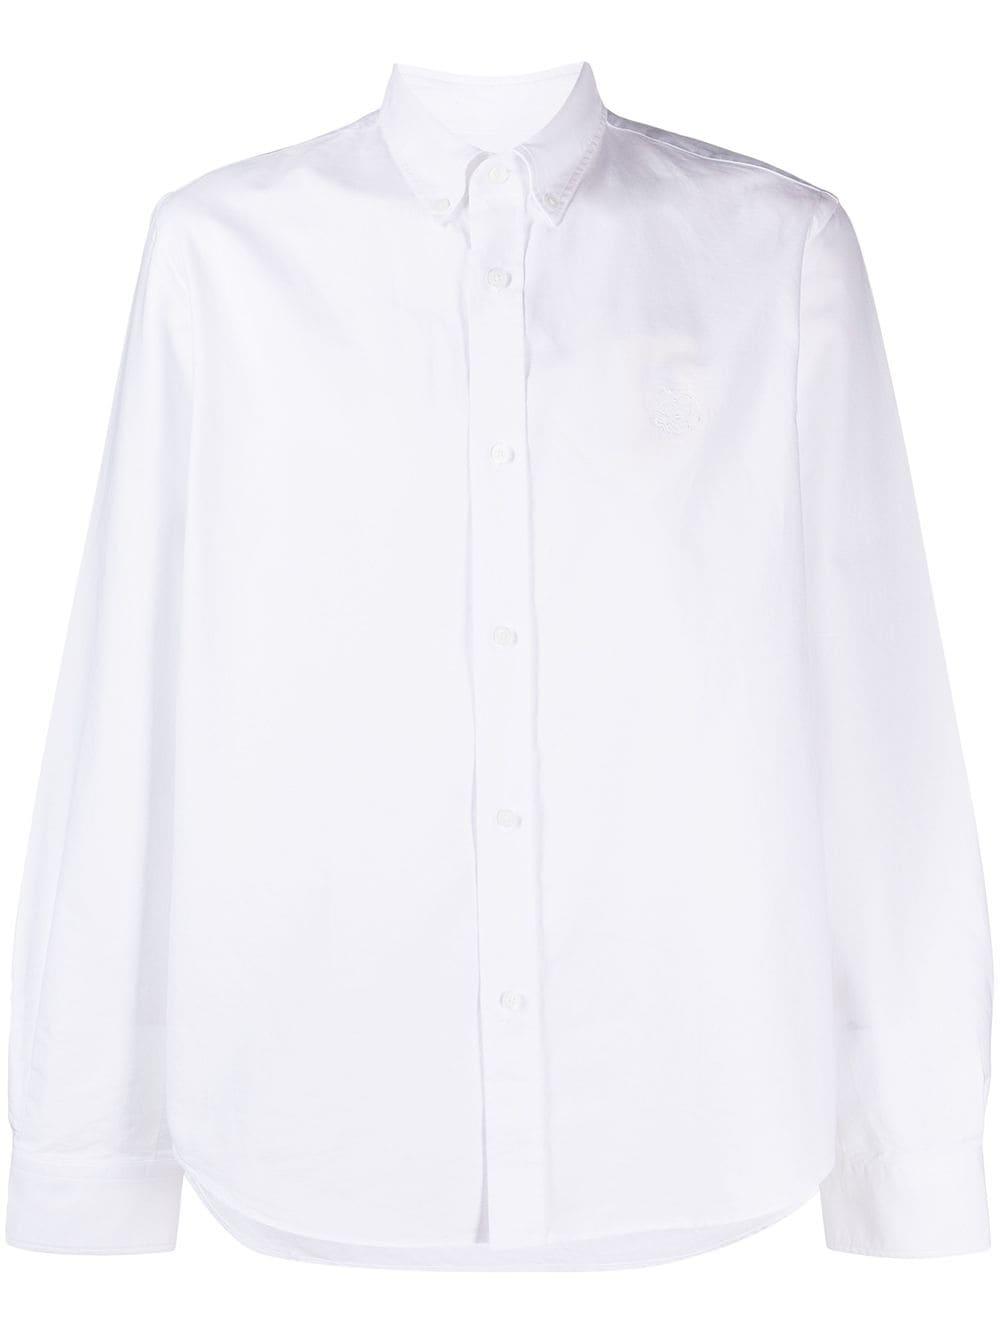 EMBROIDERED LOGO SHIRT KENZO | Shirts | FB55CH4001LD01